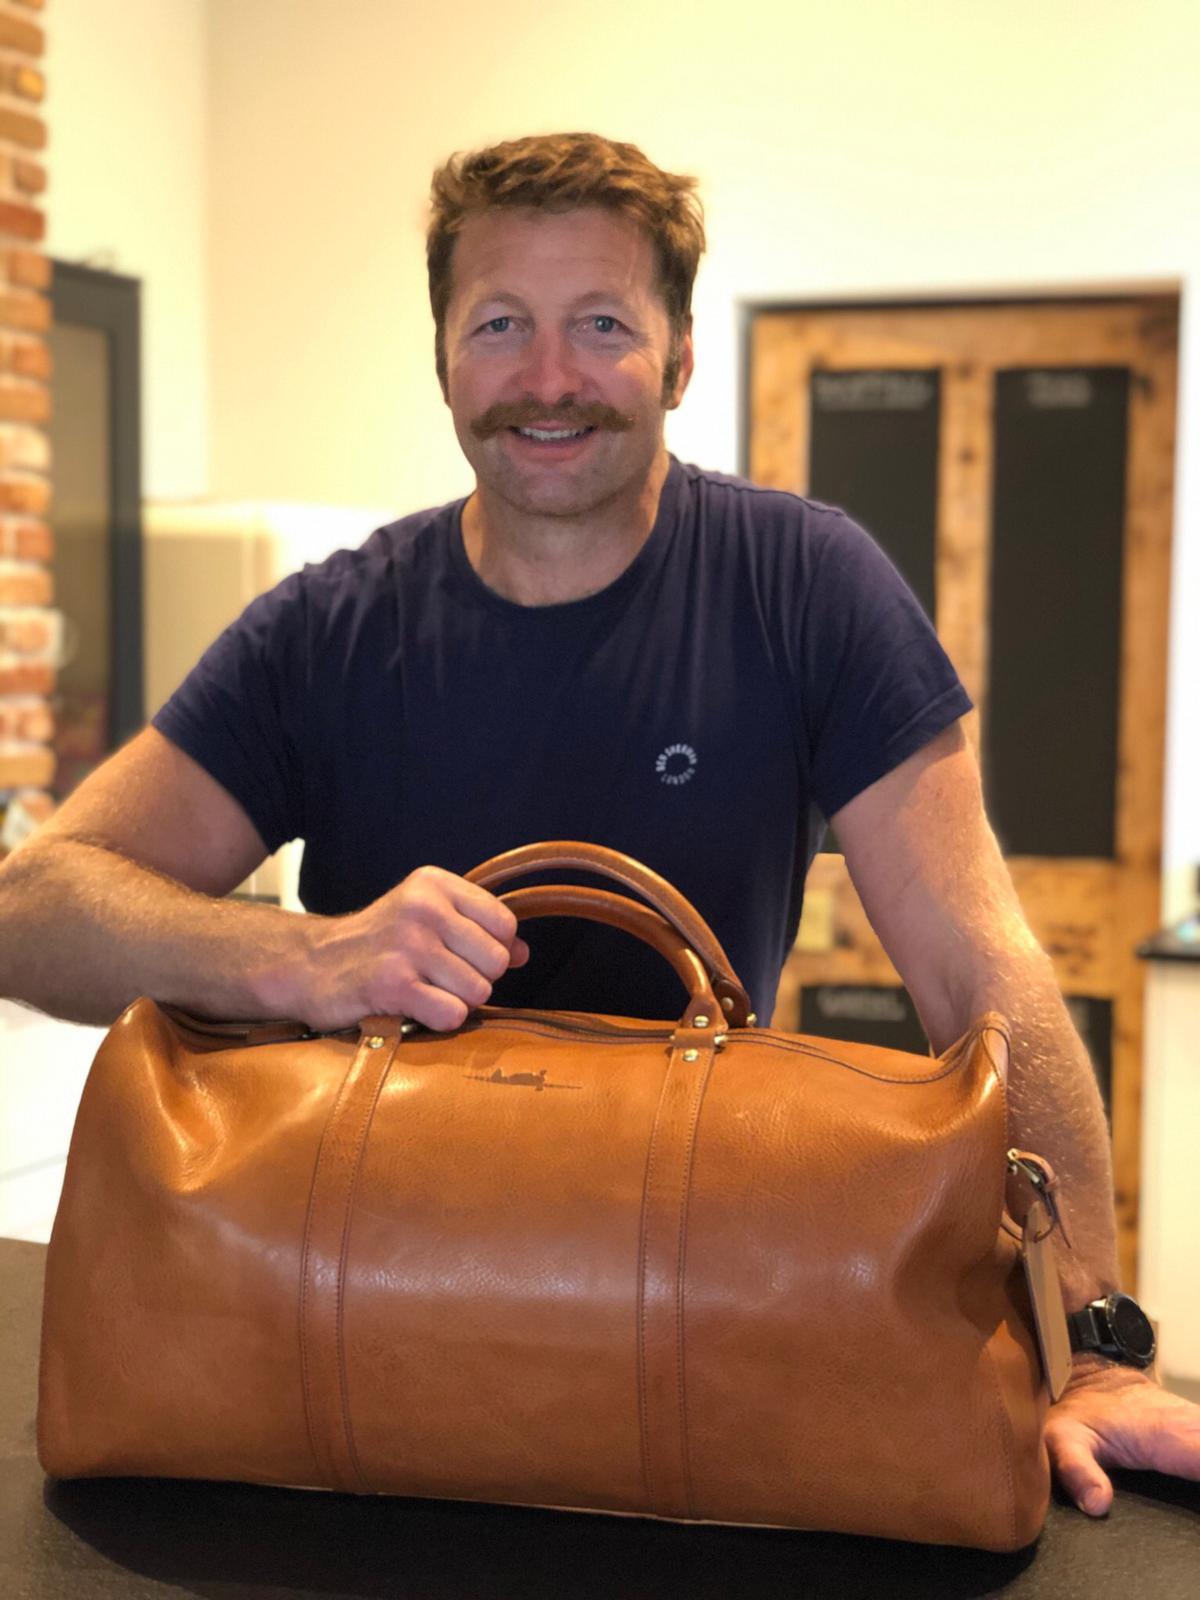 ian gough YAK 52 leather bag asali